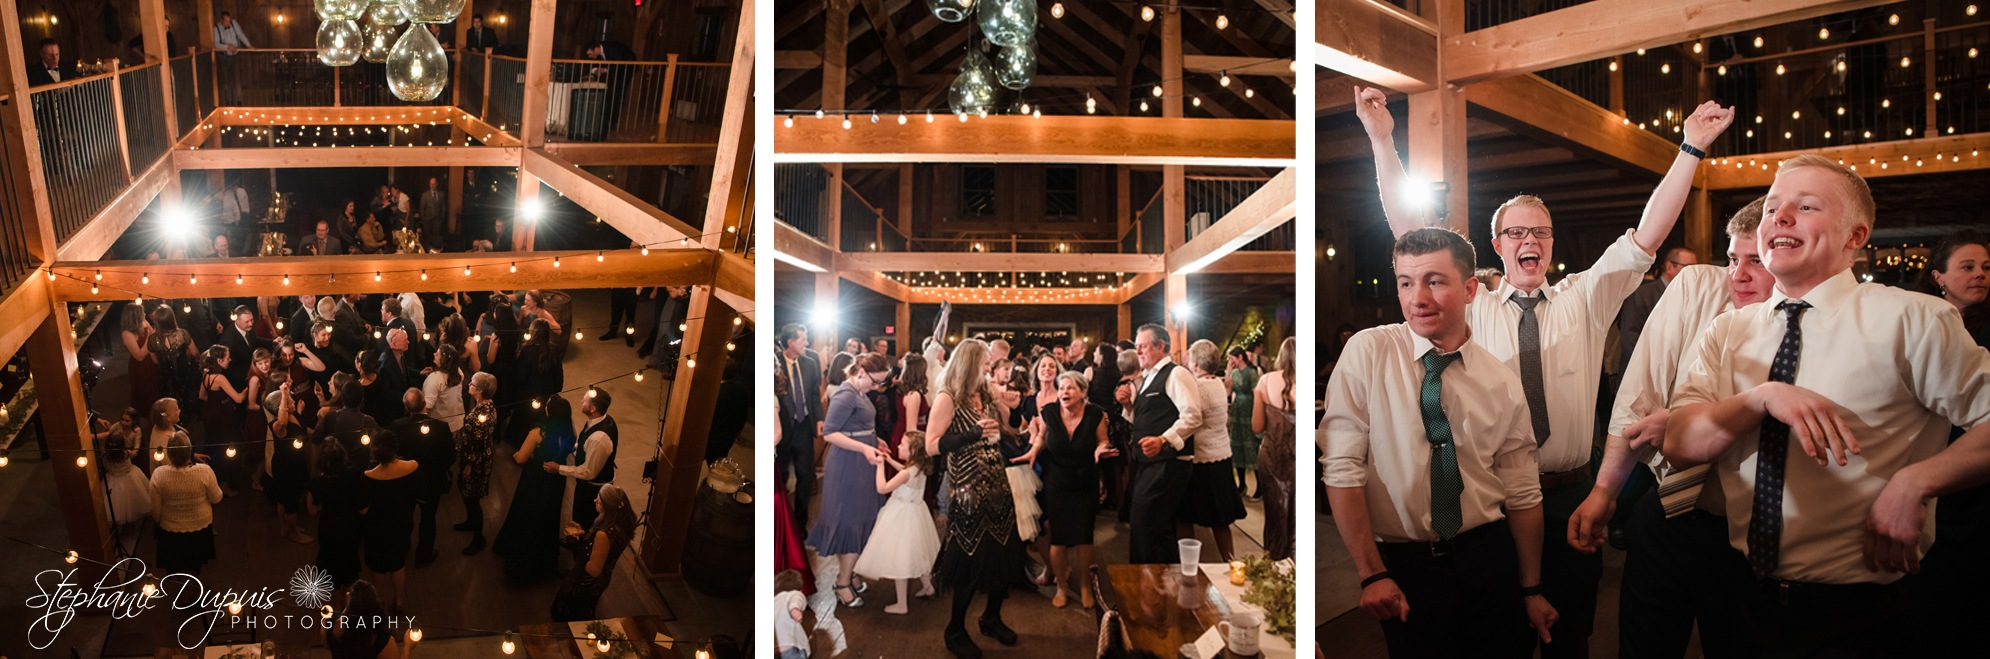 Whitefield Wedding Photographer 03 3 - Portfolio: Kittle Wedding